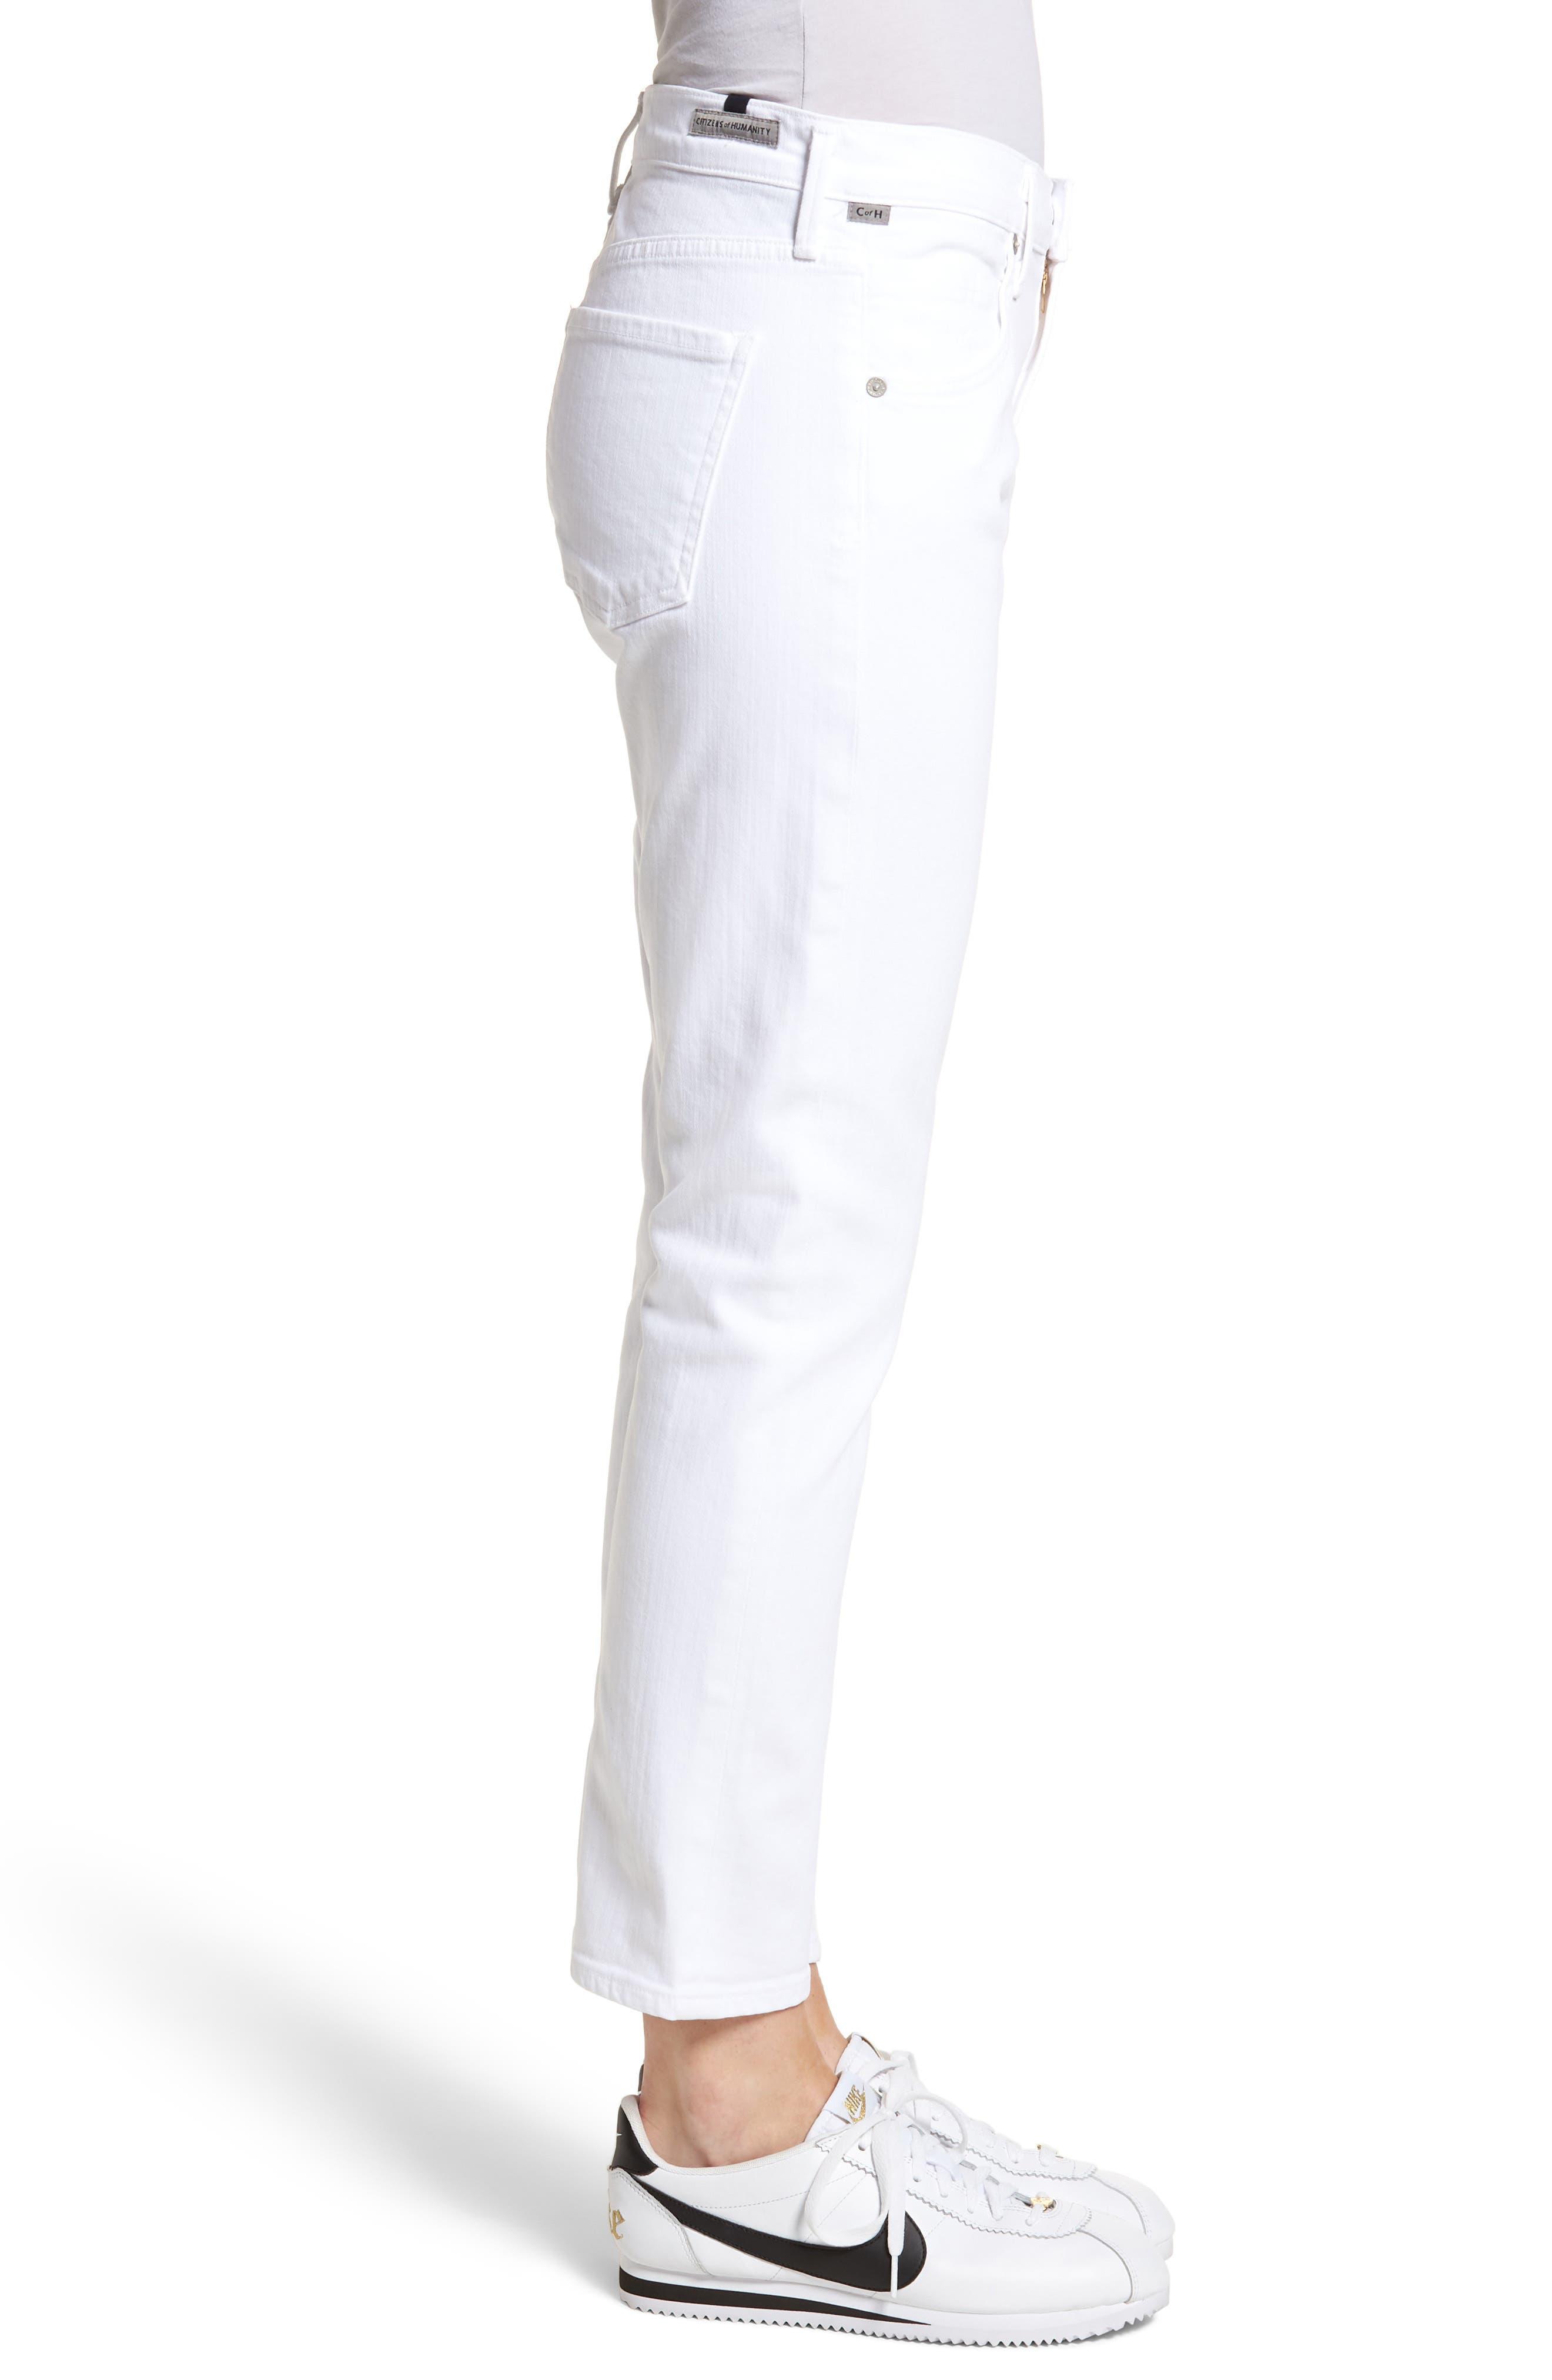 Elsa Ankle Skinny Jeans,                             Alternate thumbnail 3, color,                             OPTIC WHITE